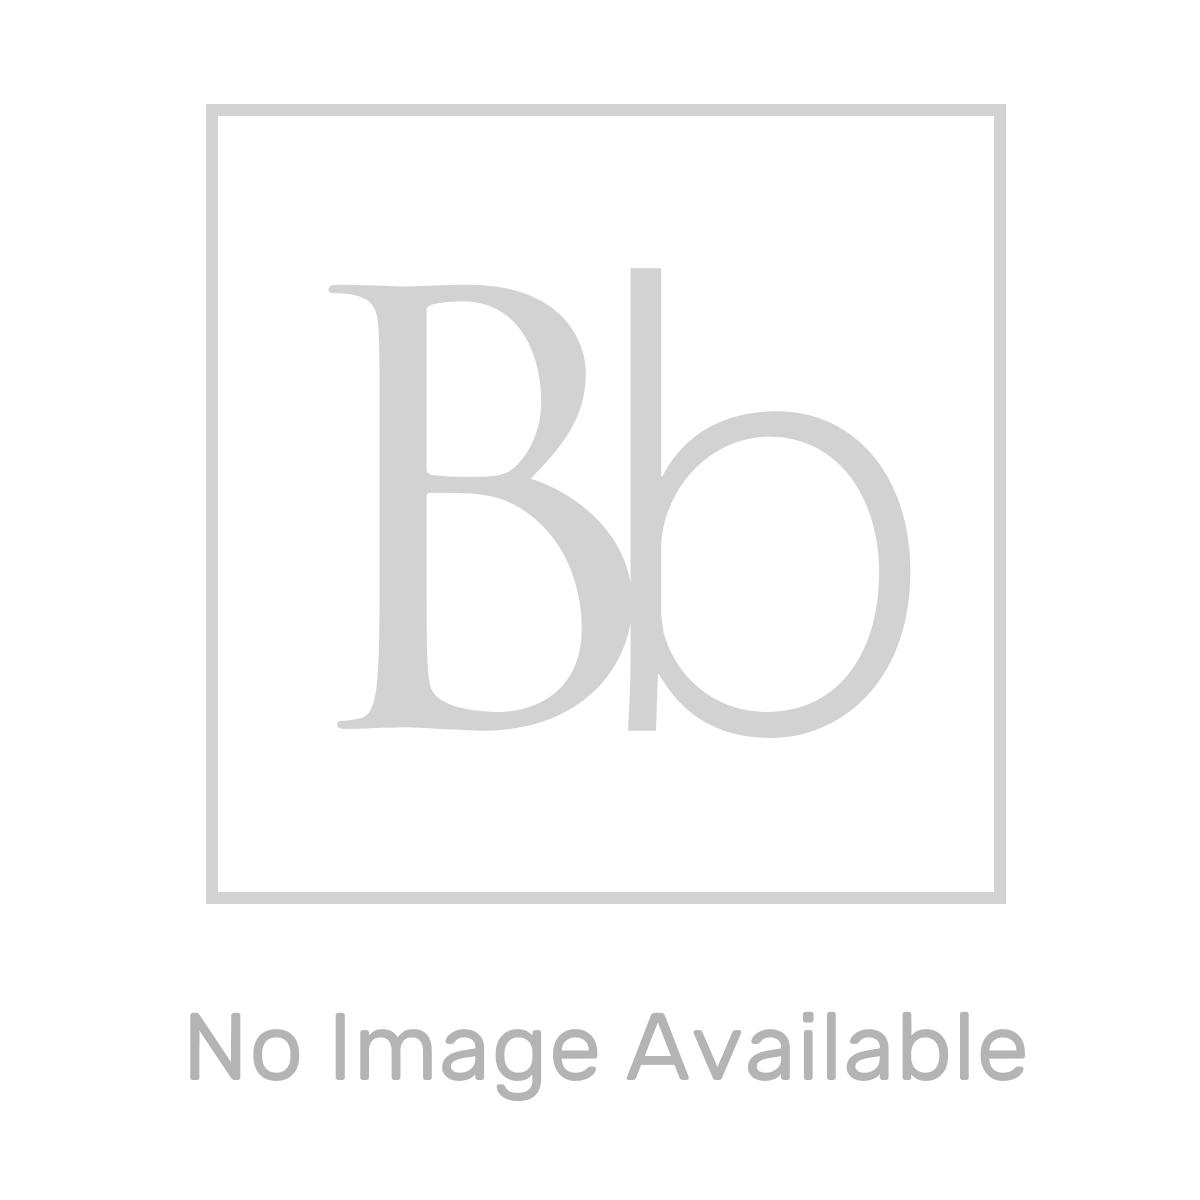 BTL Perla Marble Wall Hung 2-Drawer Vanity Unit with Basin 900mm